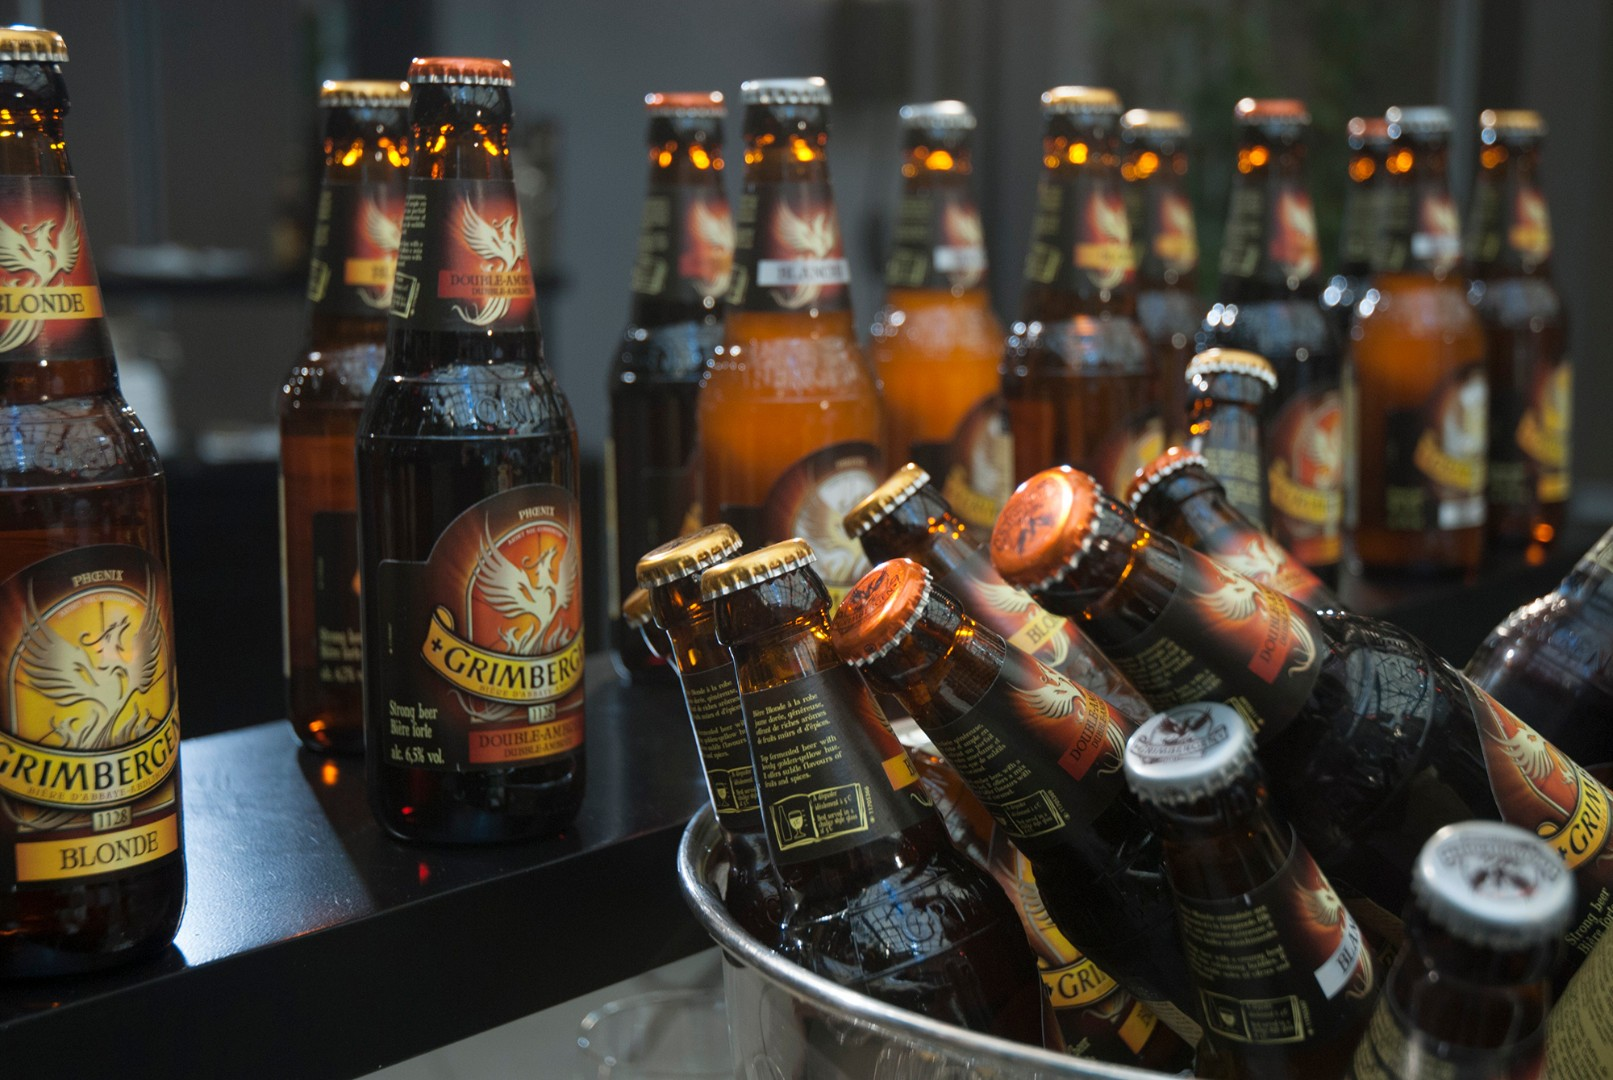 Cerveza de abadia Grimbergen Blonde